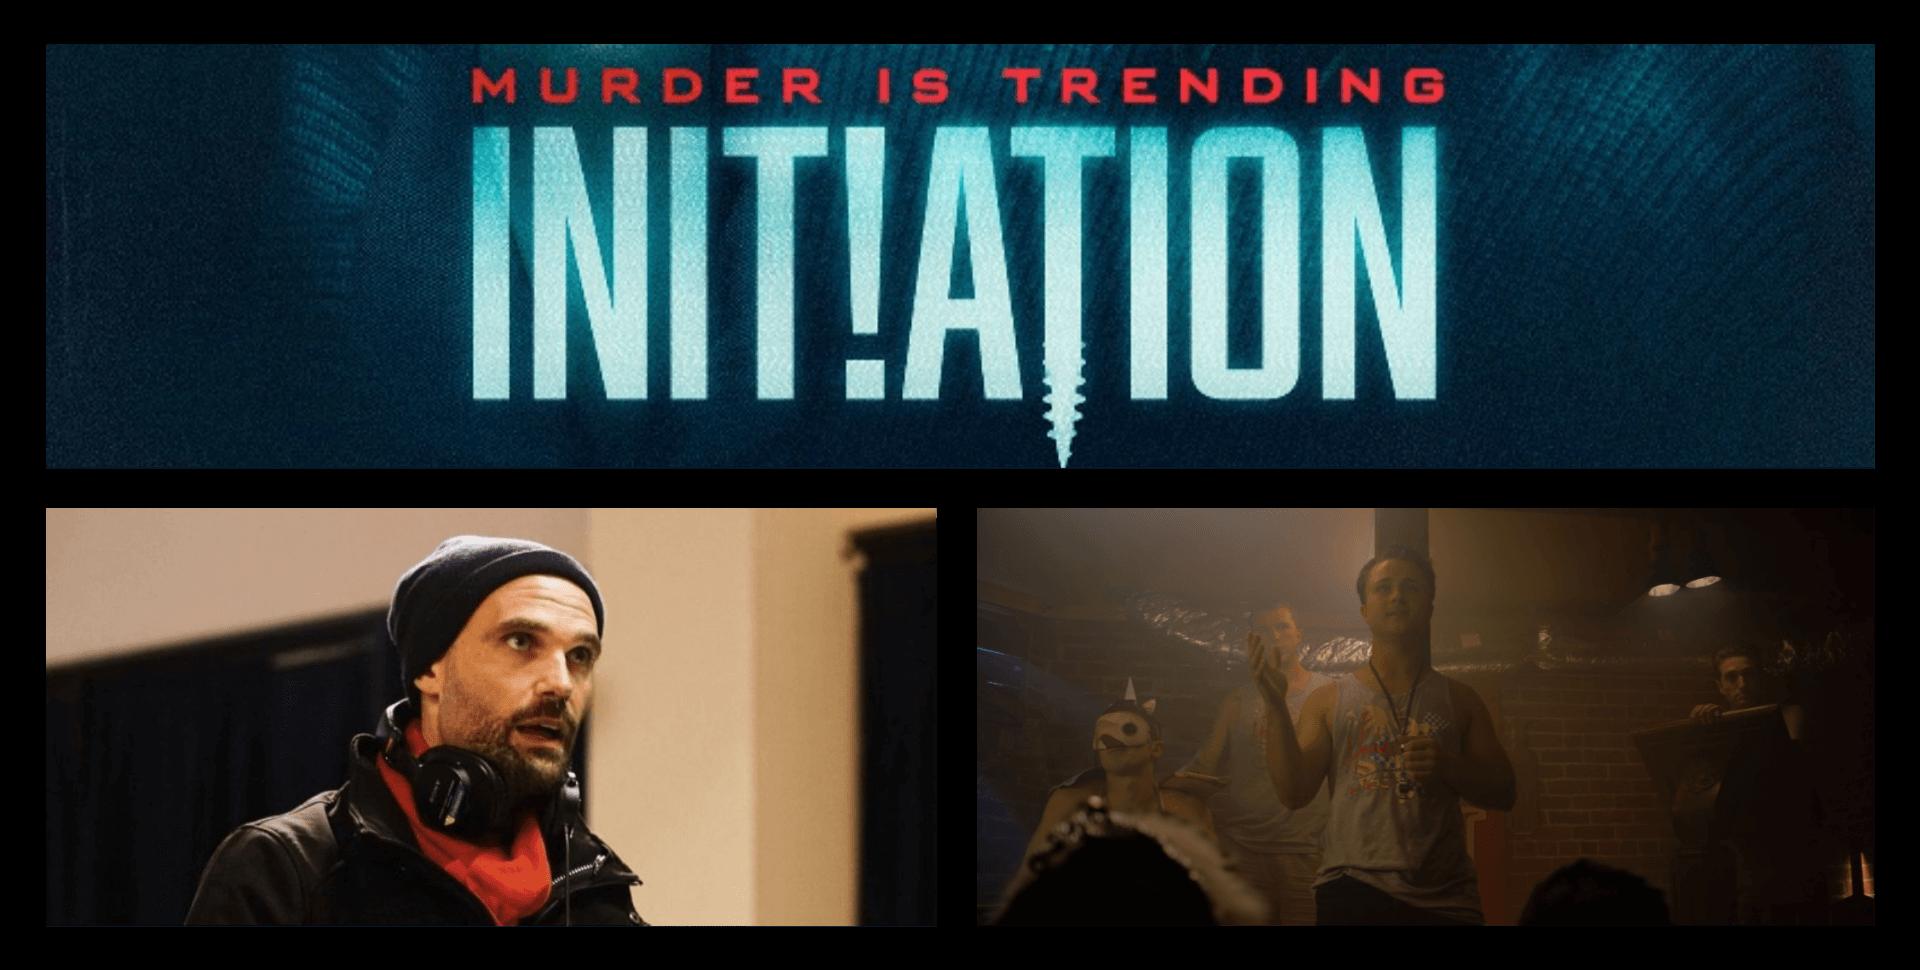 Initiation - Interview with Filmmaker John Berardo